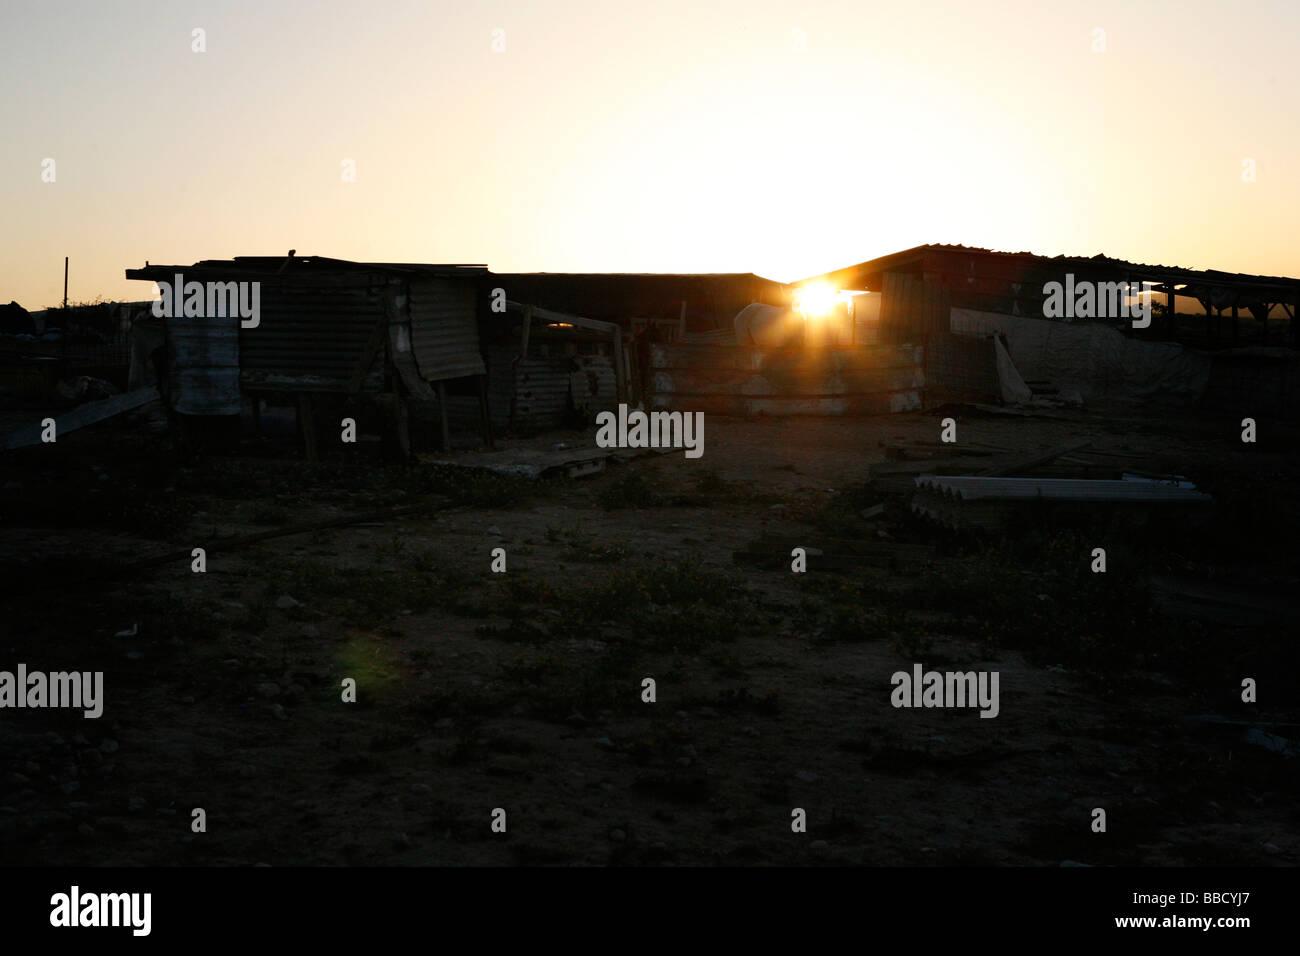 Chicken sheds at sundown. El Araqeeb, Israel - Stock Image